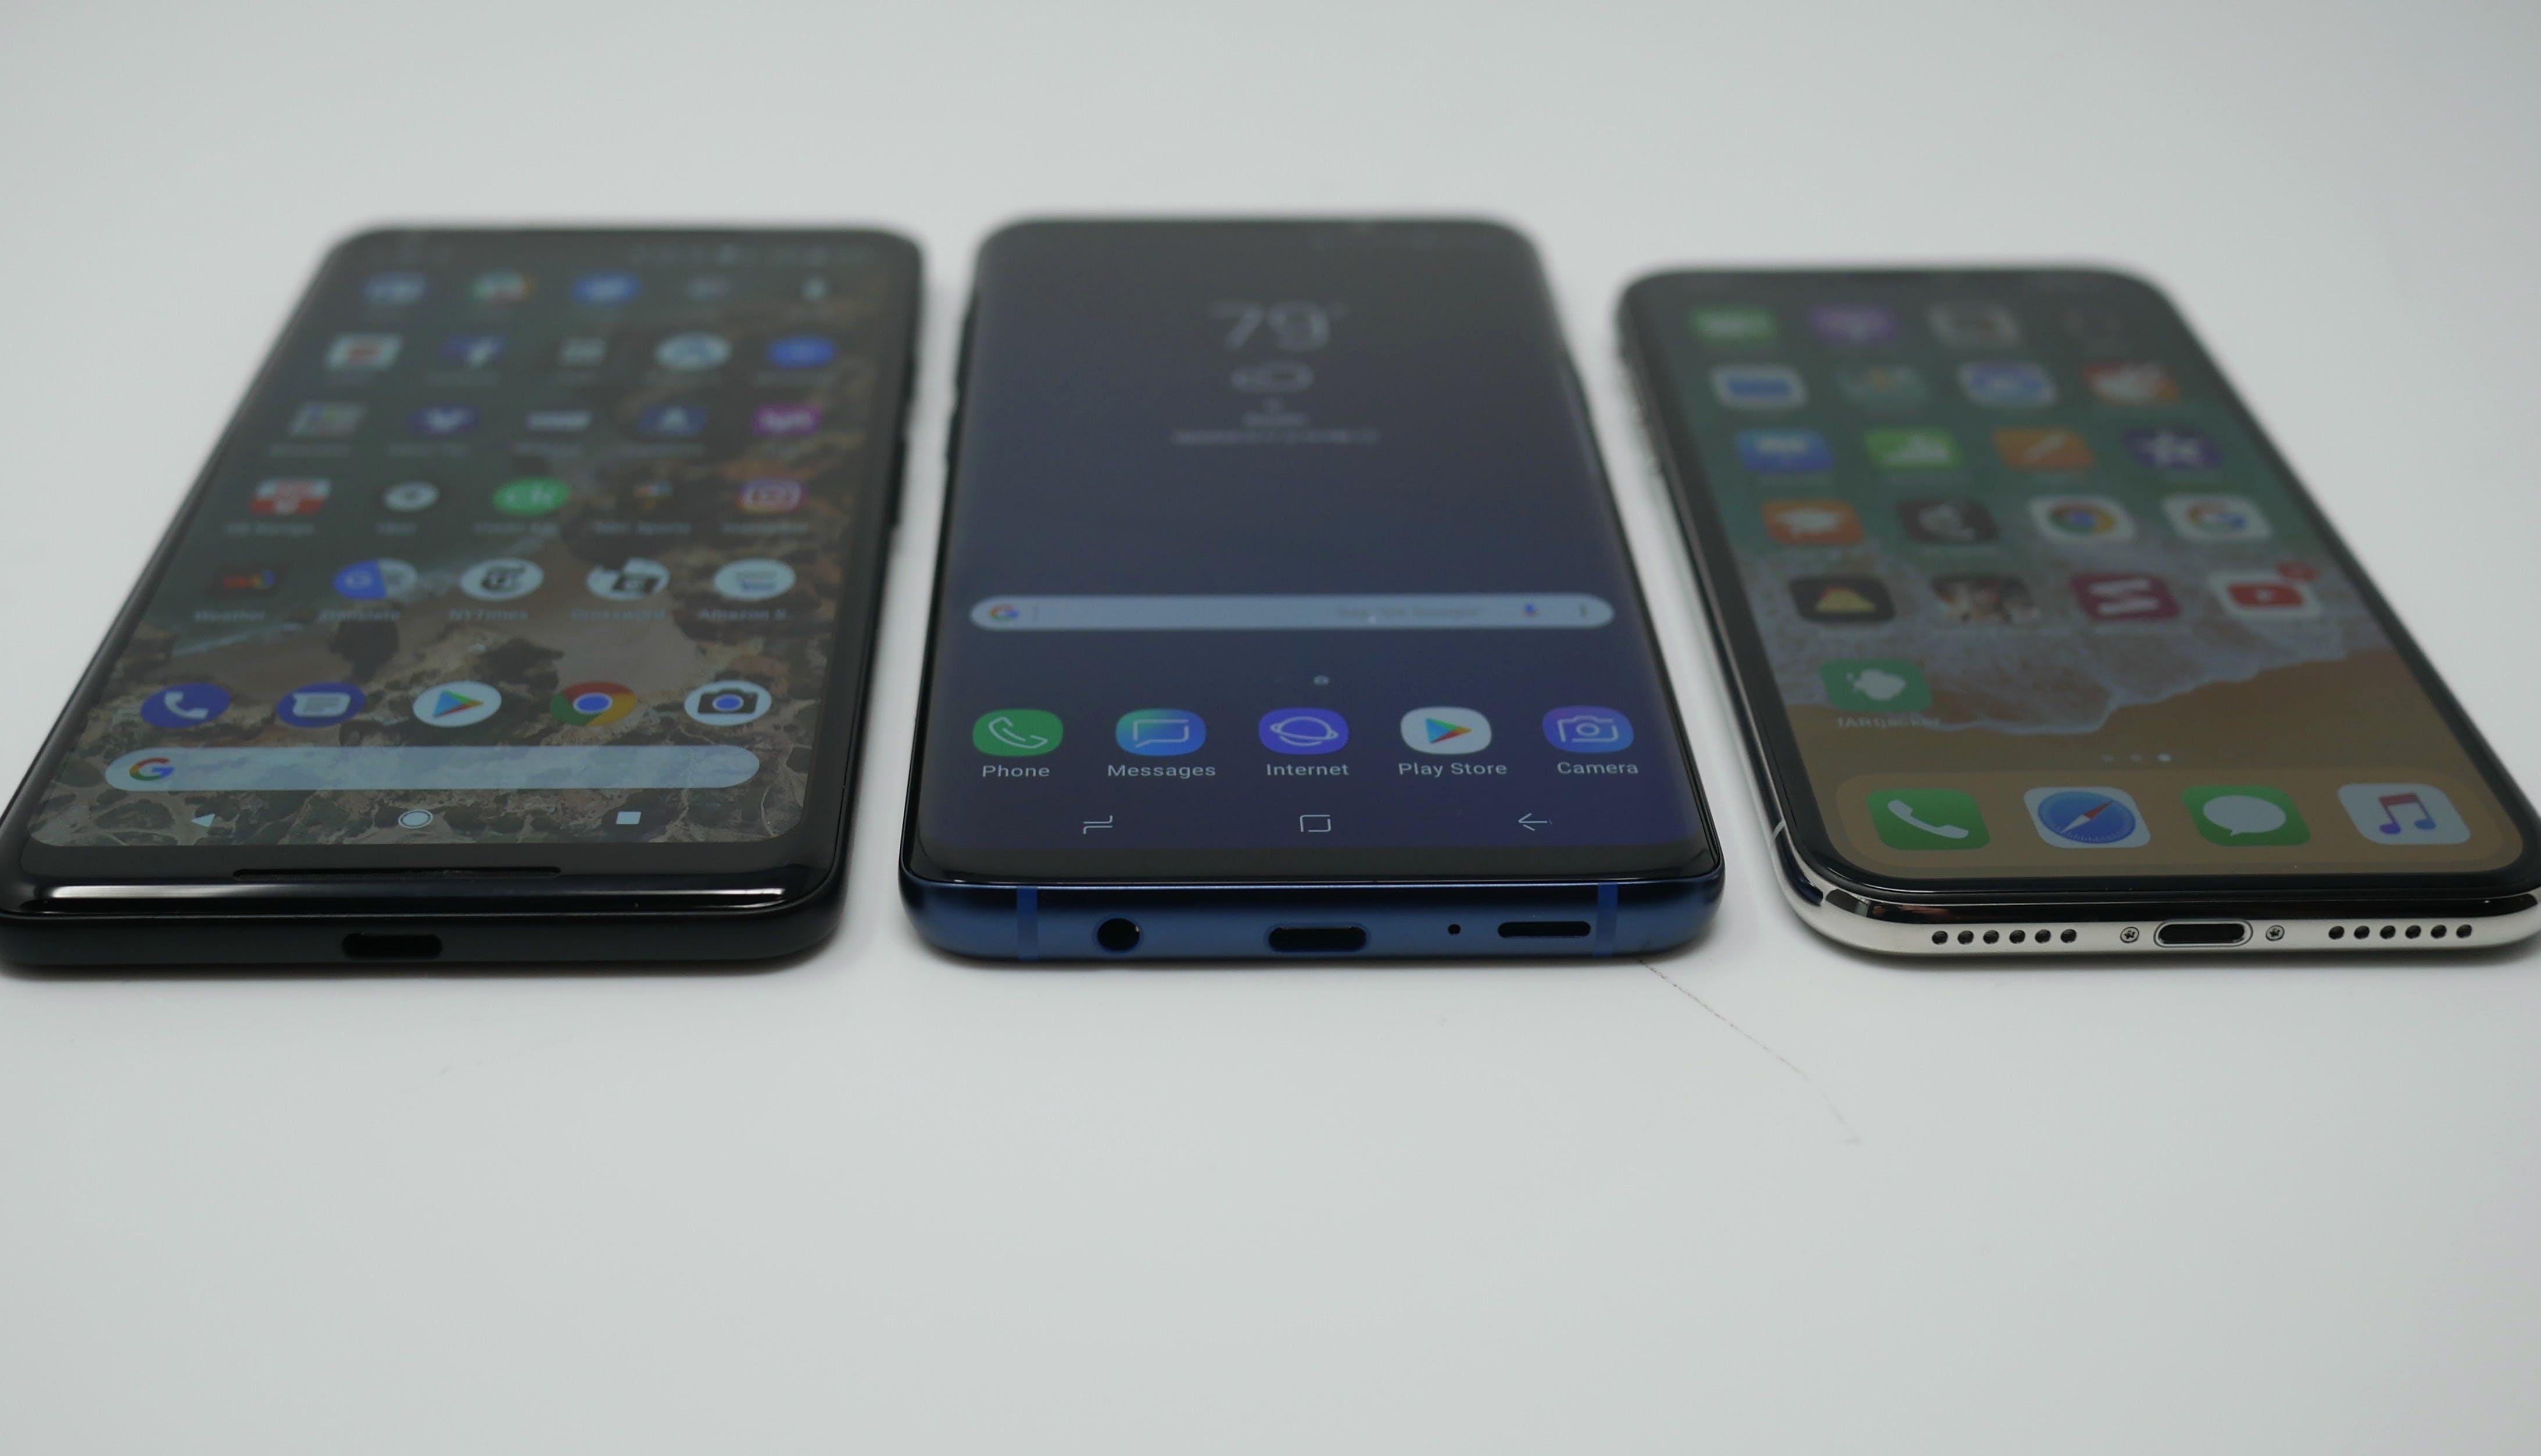 samsung galaxy s9 vs iphone x vs google pixel 2 xl